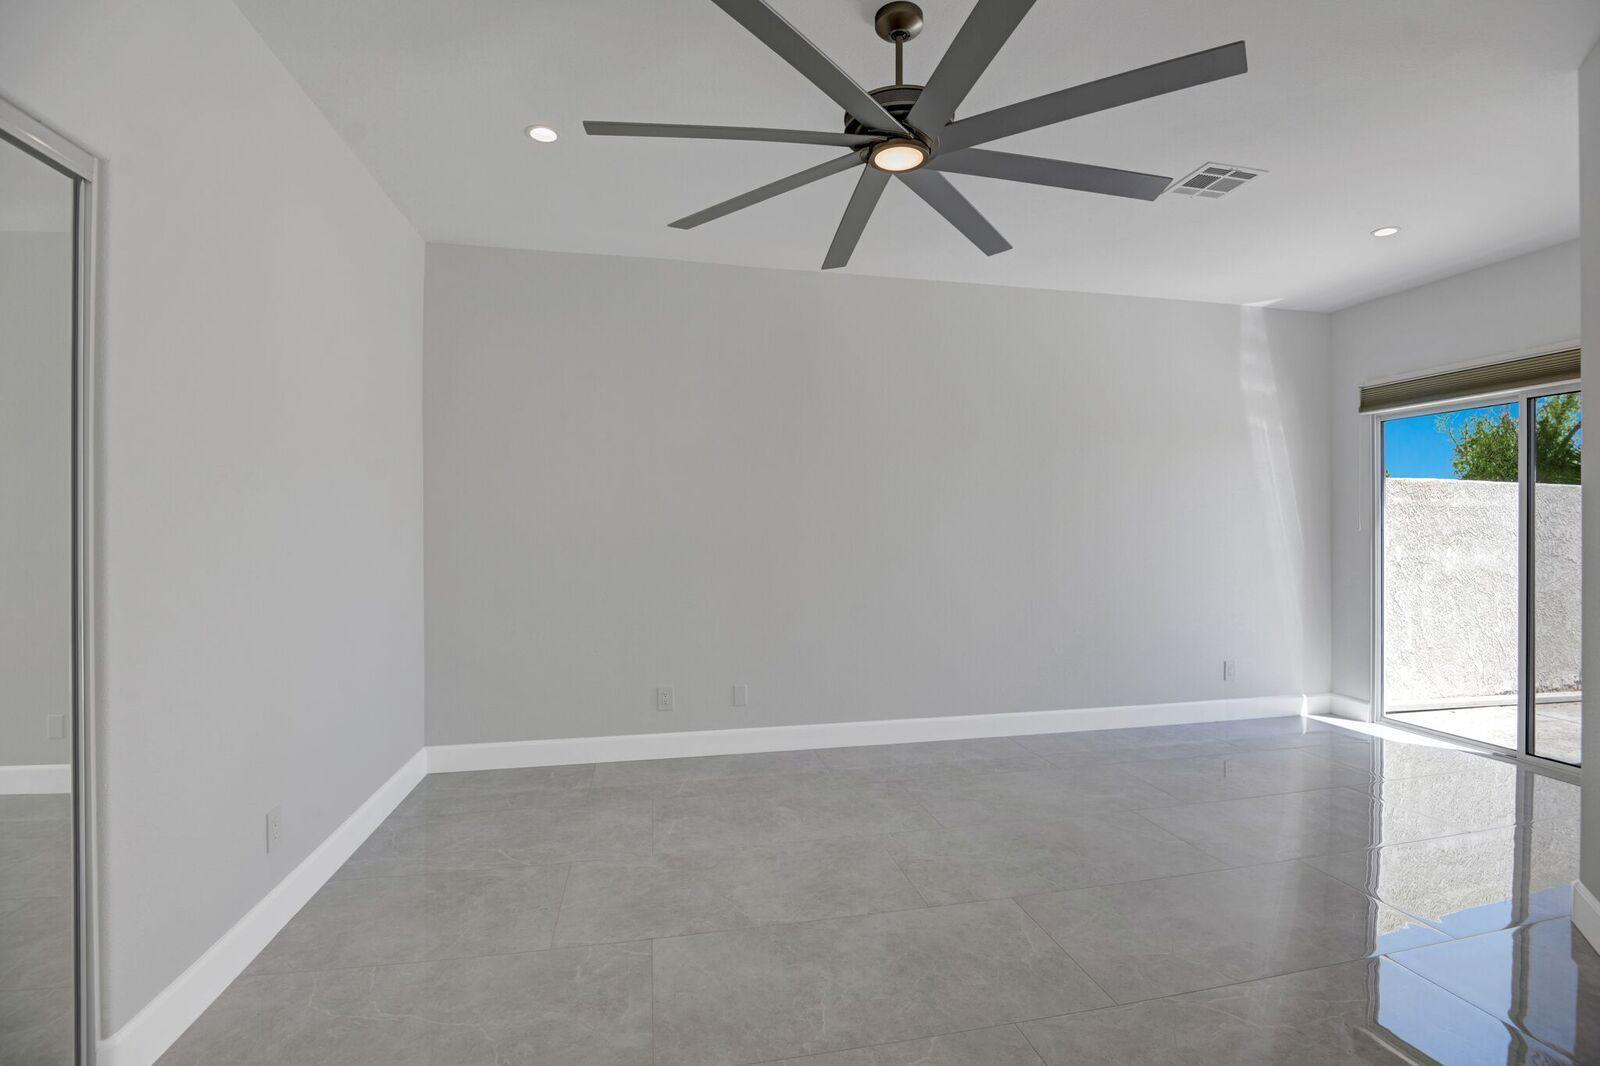 12 Vistara Drive, Rancho Mirage, California 92270, 3 Bedrooms Bedrooms, ,2 BathroomsBathrooms,Residential,For Sale,12 Vistara Drive,219042665